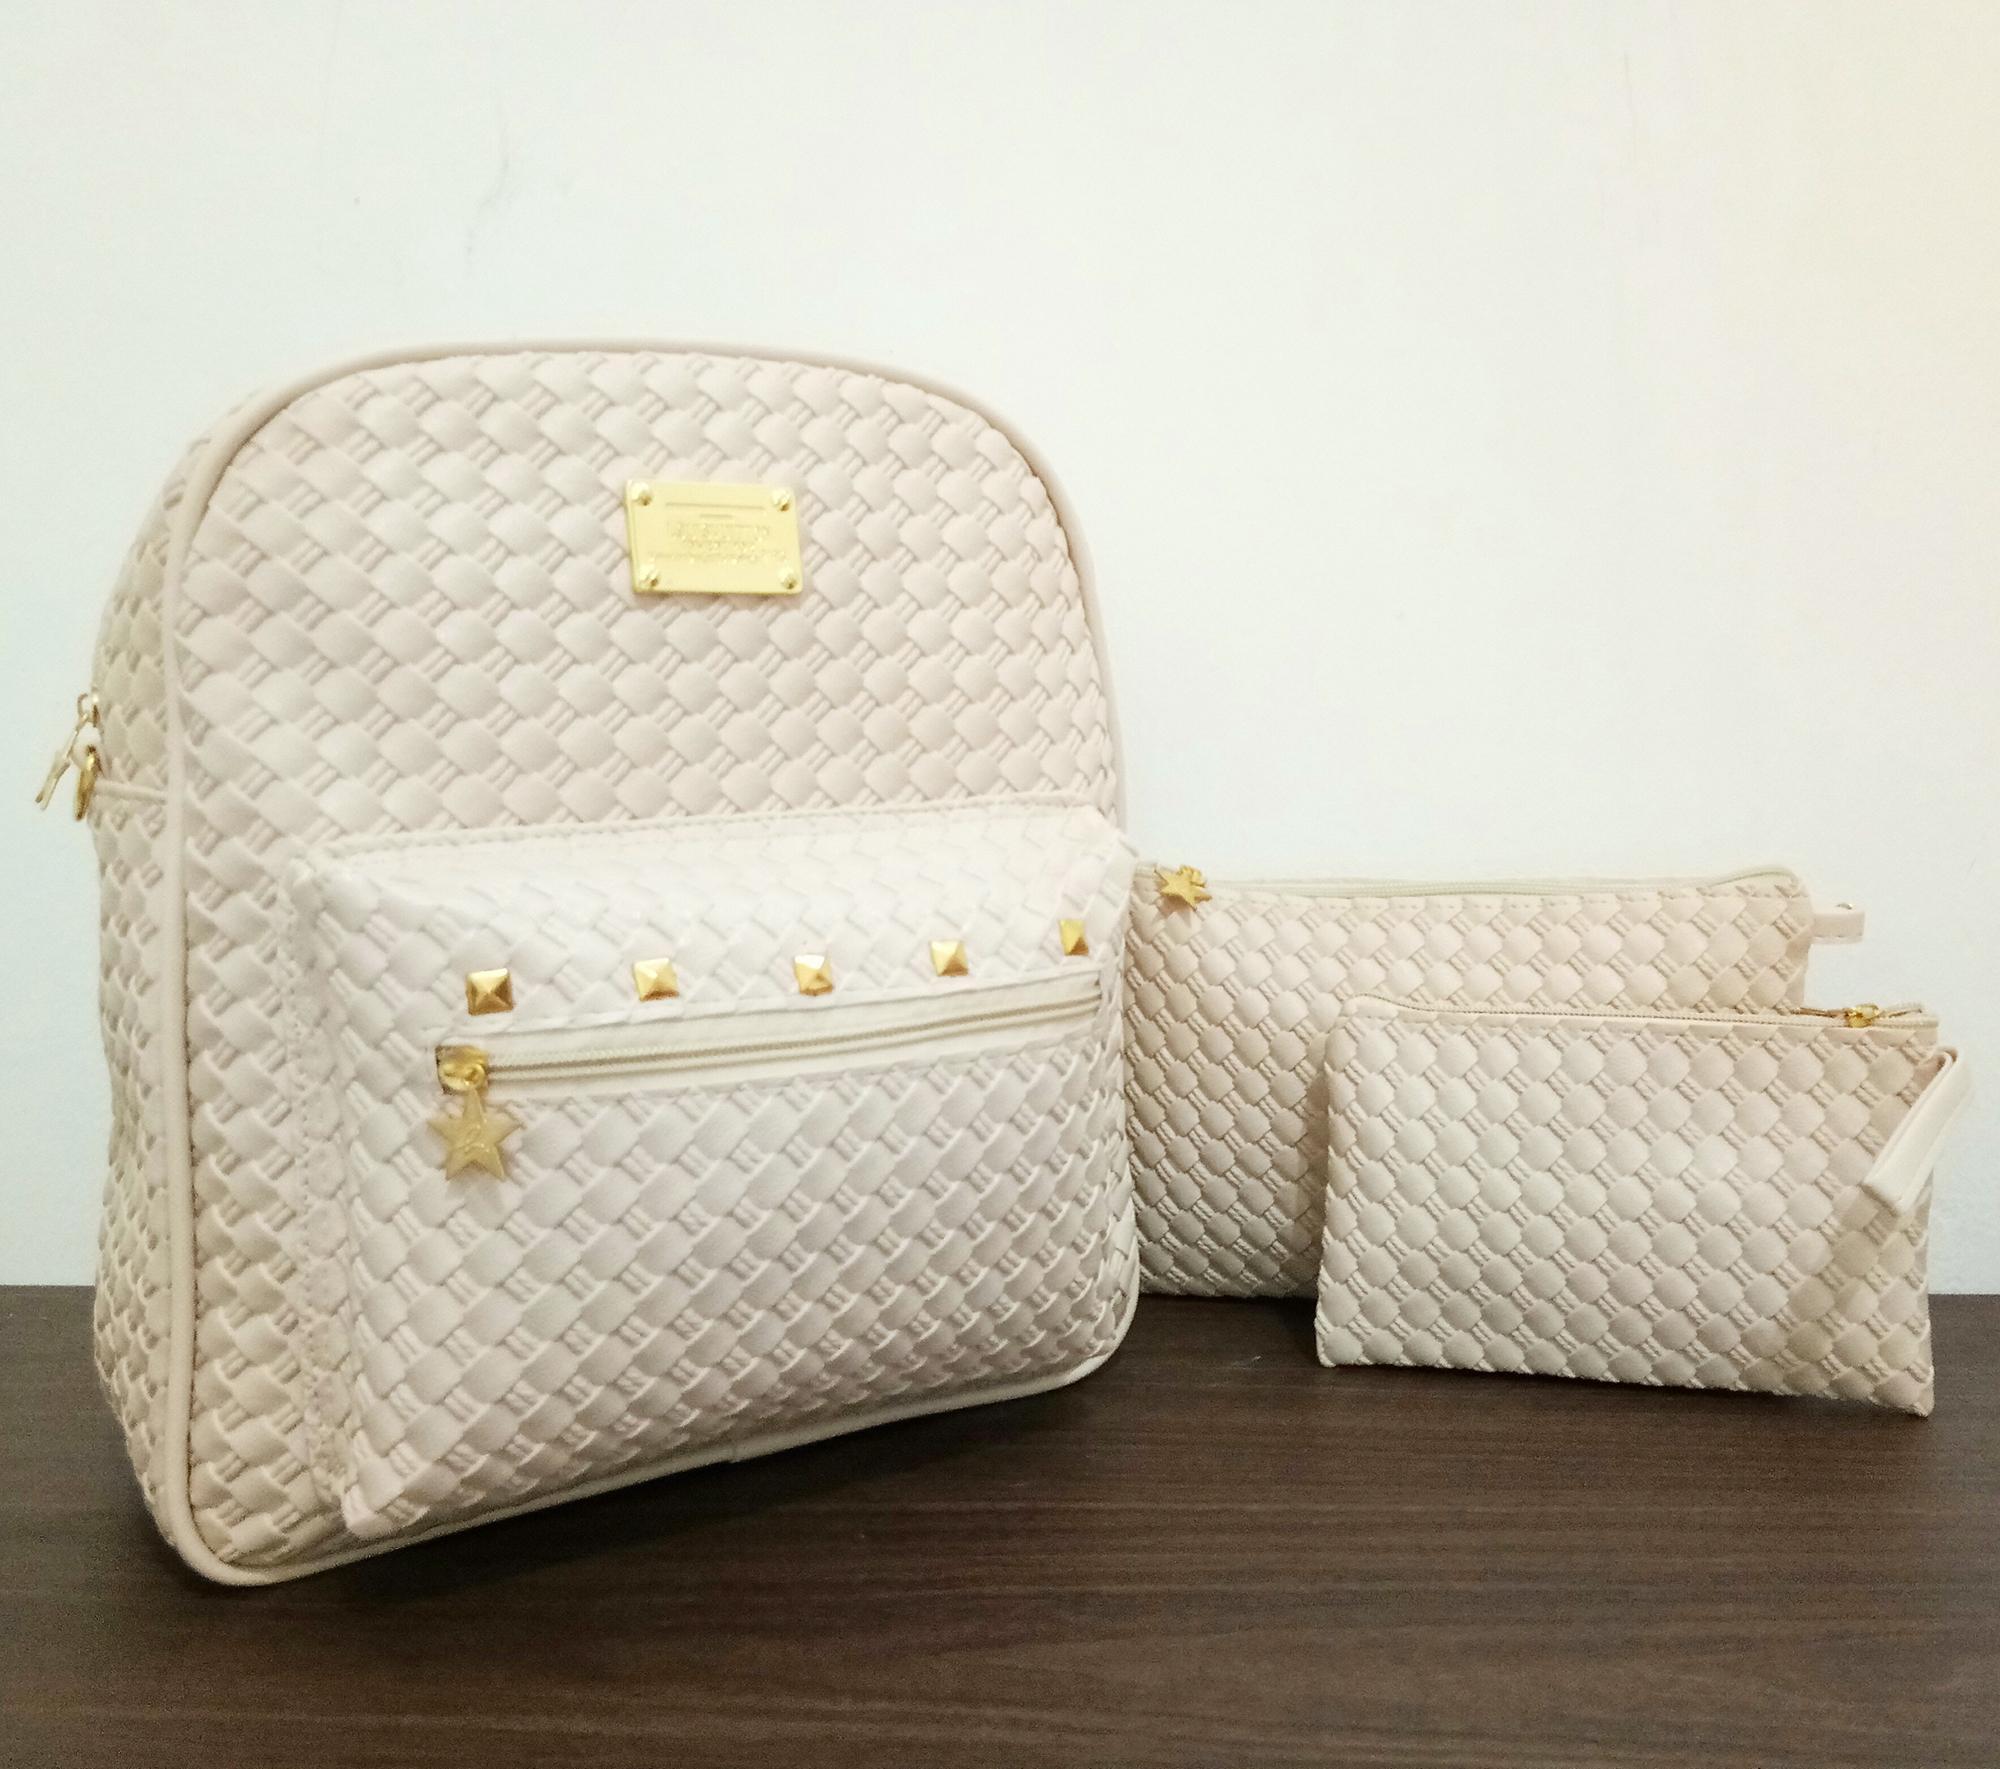 Athar Tas 3 in 1 Ransel Sling Bag Pouch Wanita Motif Anyam Tikar Syntetic